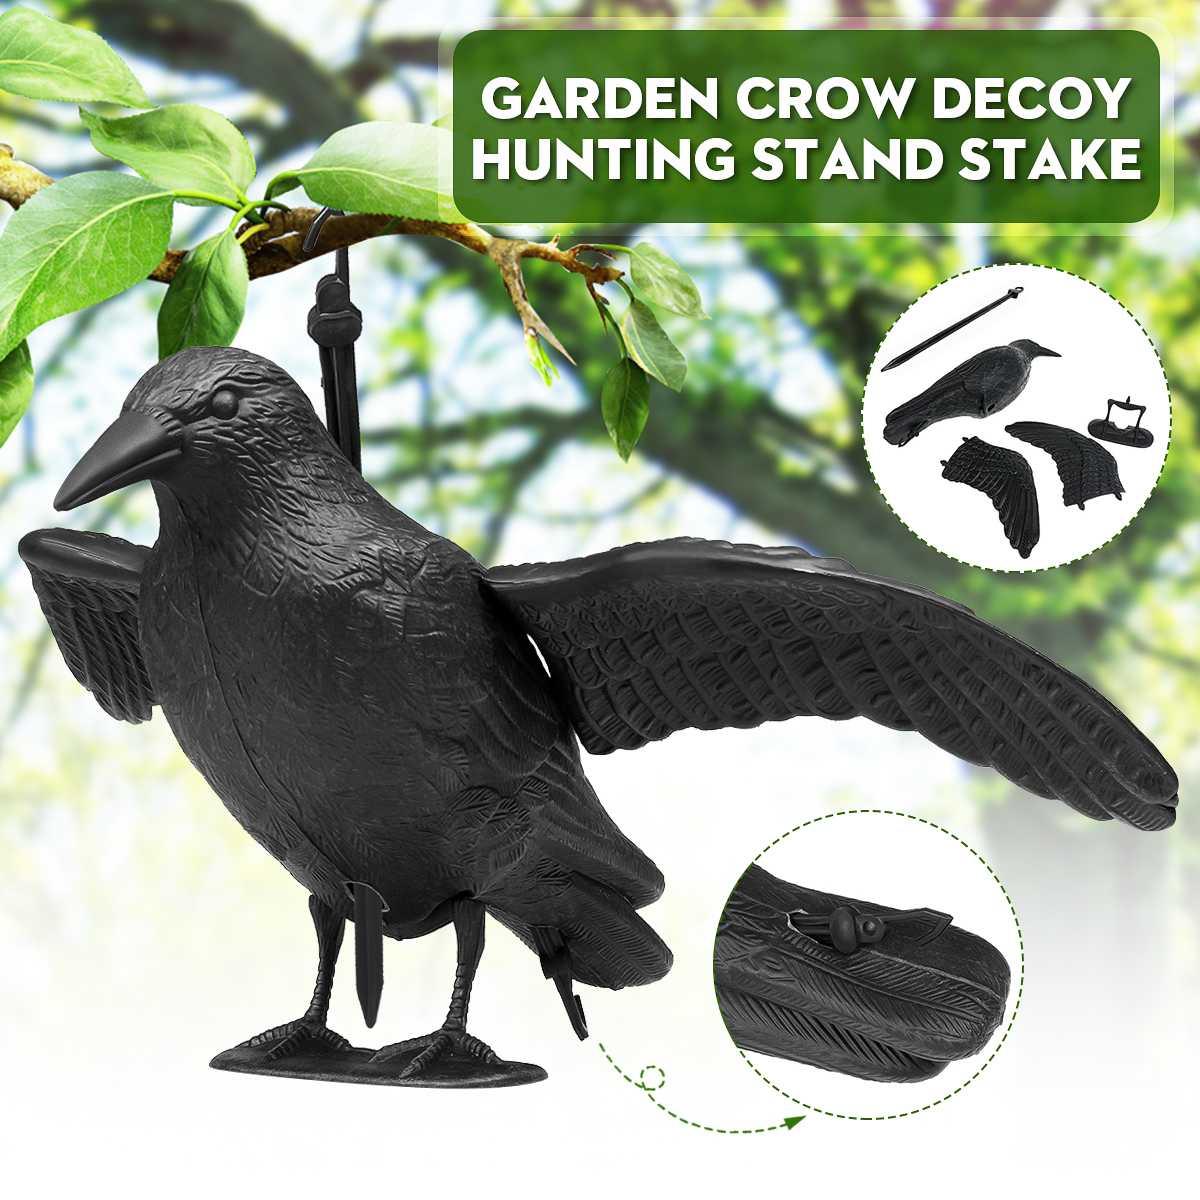 Crow Hunting Decoy Scare Scarecrow Realistic Garden Yard Bird Repeller Waterproof Decoration Supplies Gift Scarer Decoration